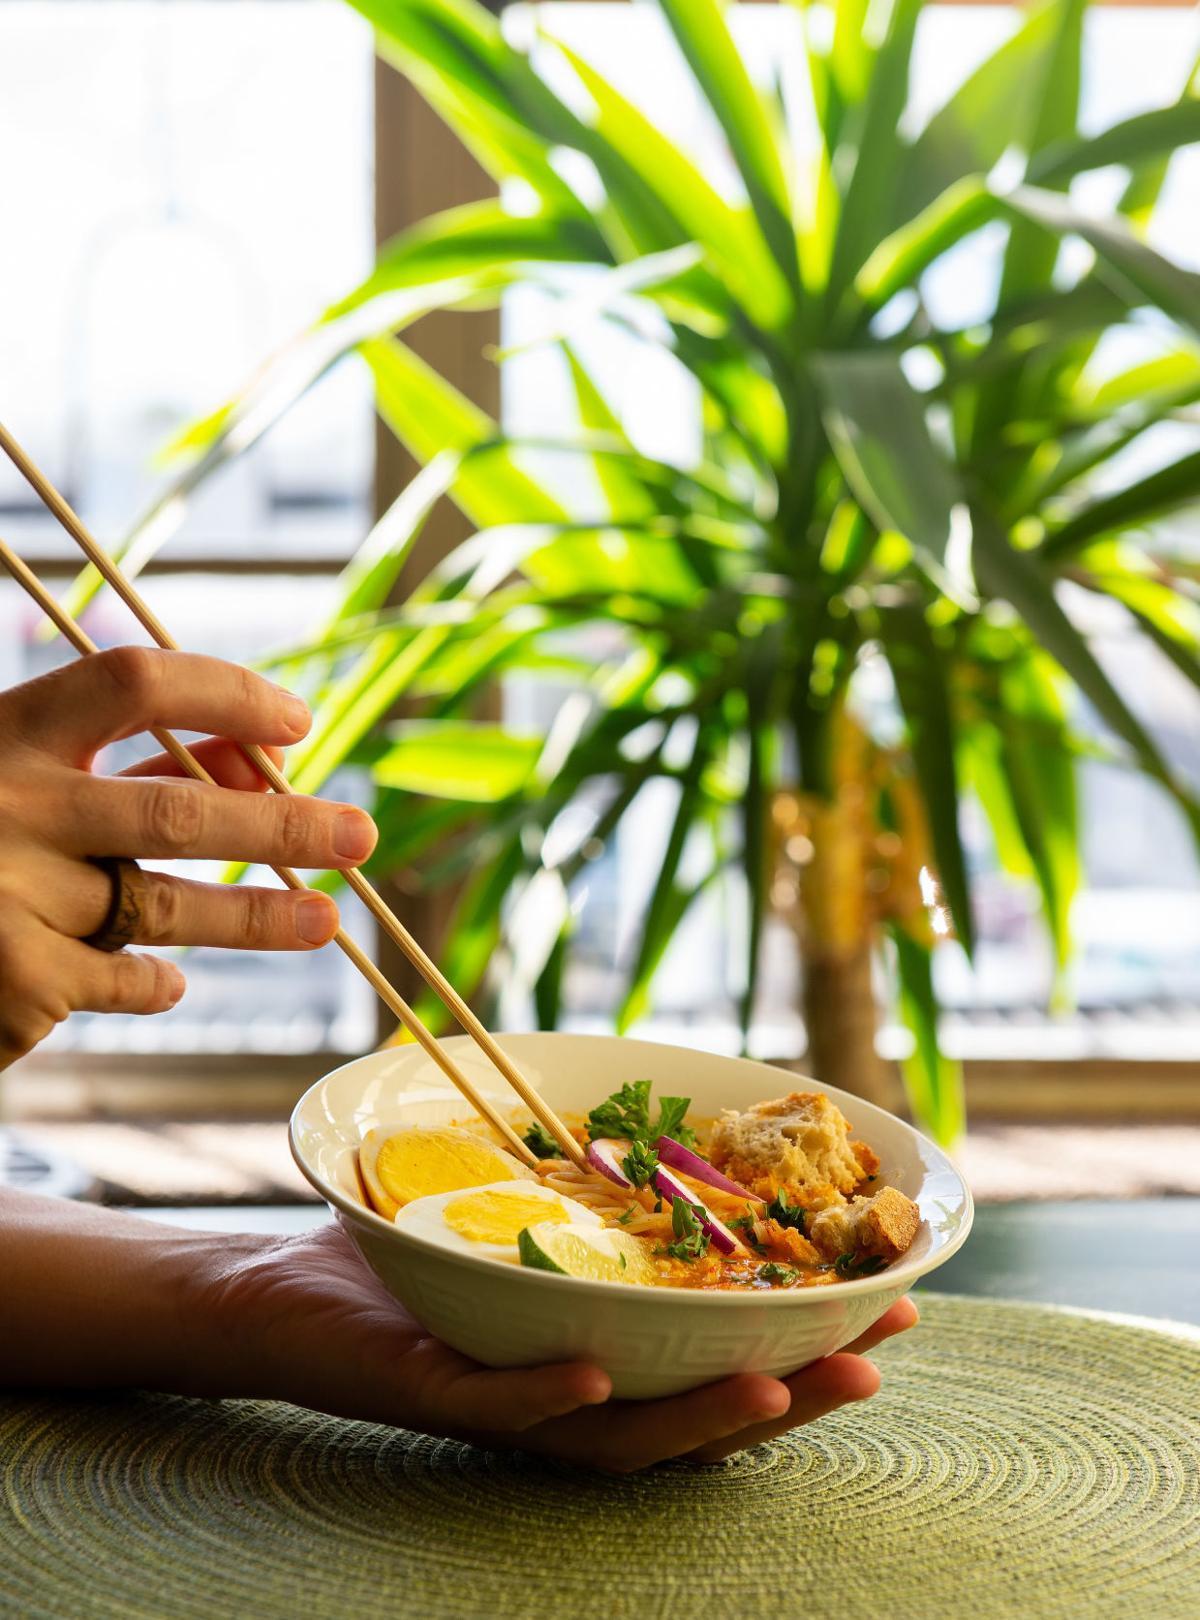 Cooking culturally: Myanmar - Mohinga